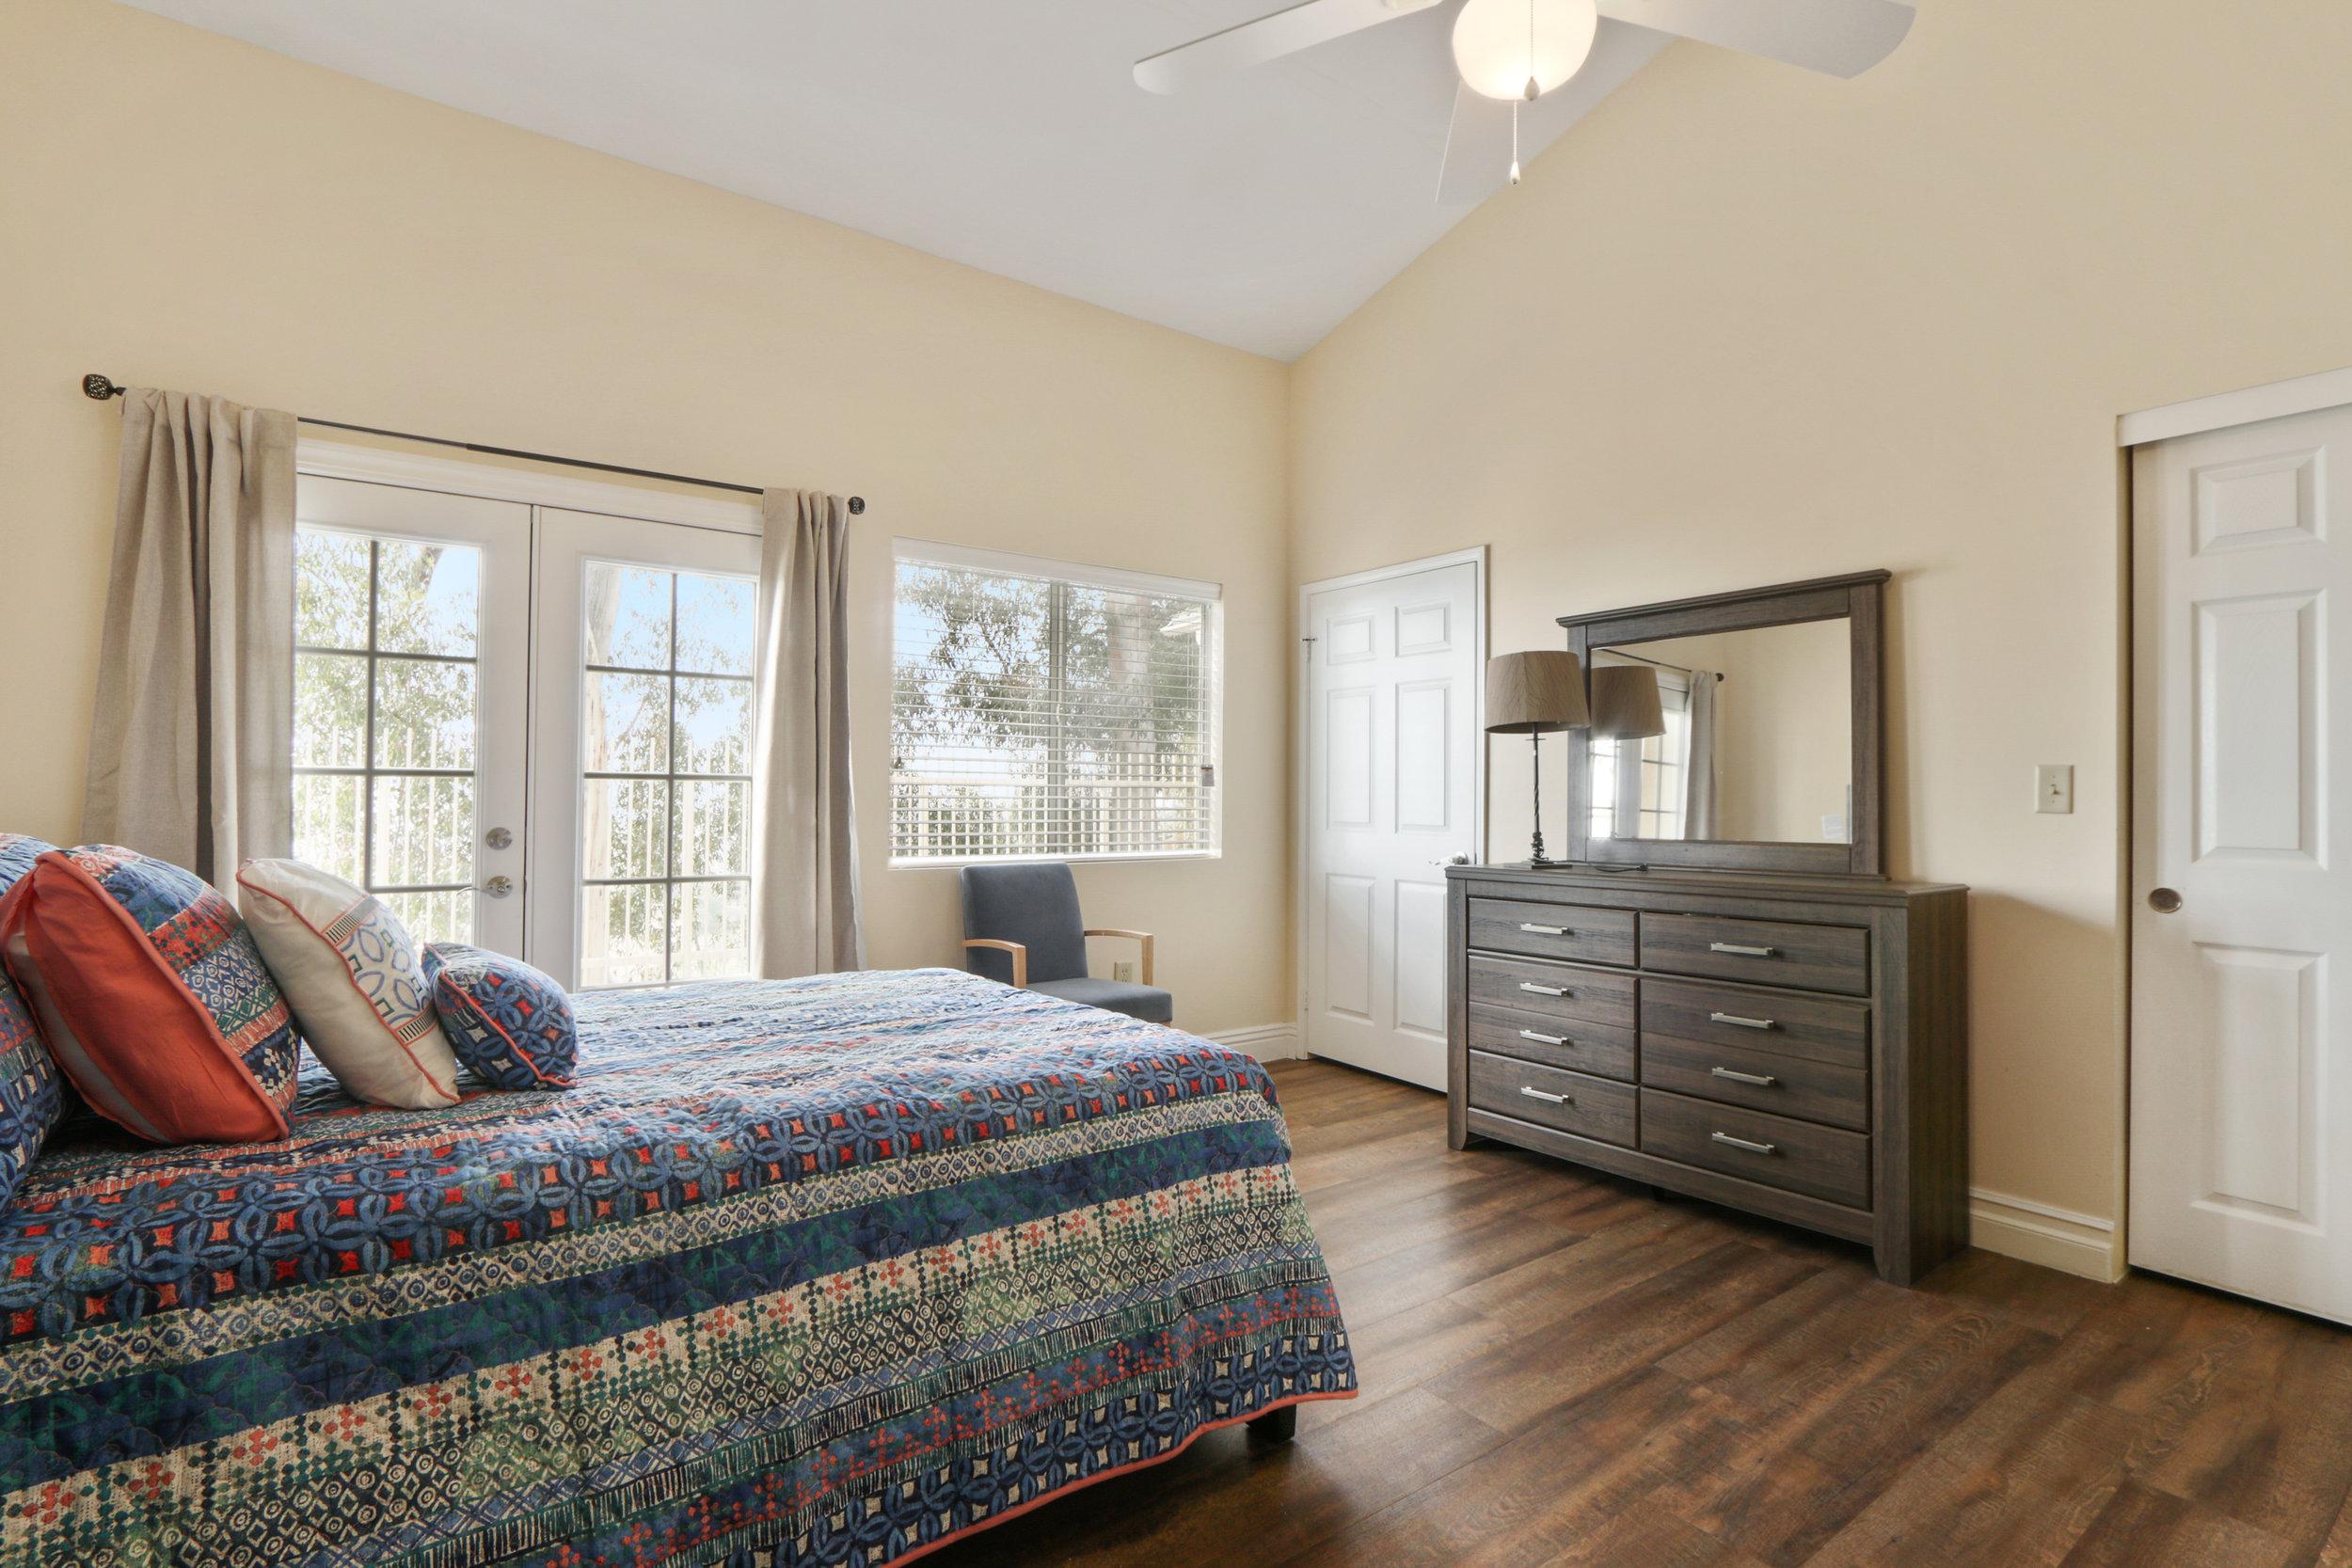 ROOM #2 - John Wayne - A full size bed with gorgeous white-wash finish.